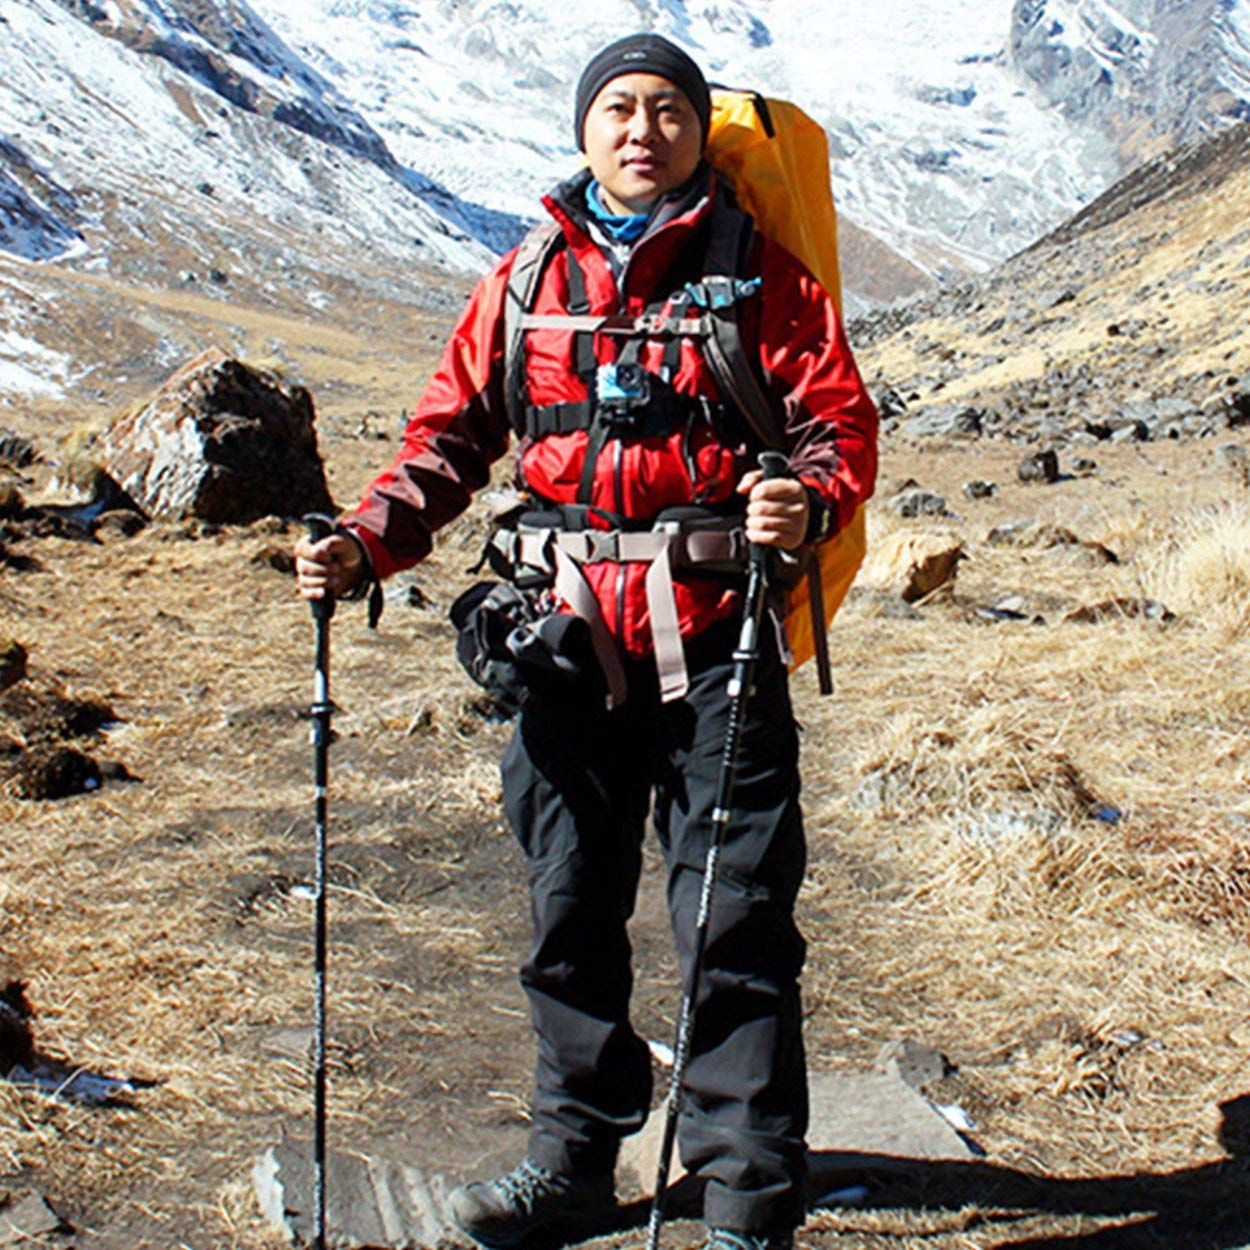 Lorenlli Fit KORAMAN Multifuncional Ligero Ligero Multifuncional Bastón para Caminar Telescópico Plegable Antideslizante Bastón para Caminar Trekking Bastón de Escalada 20ce97